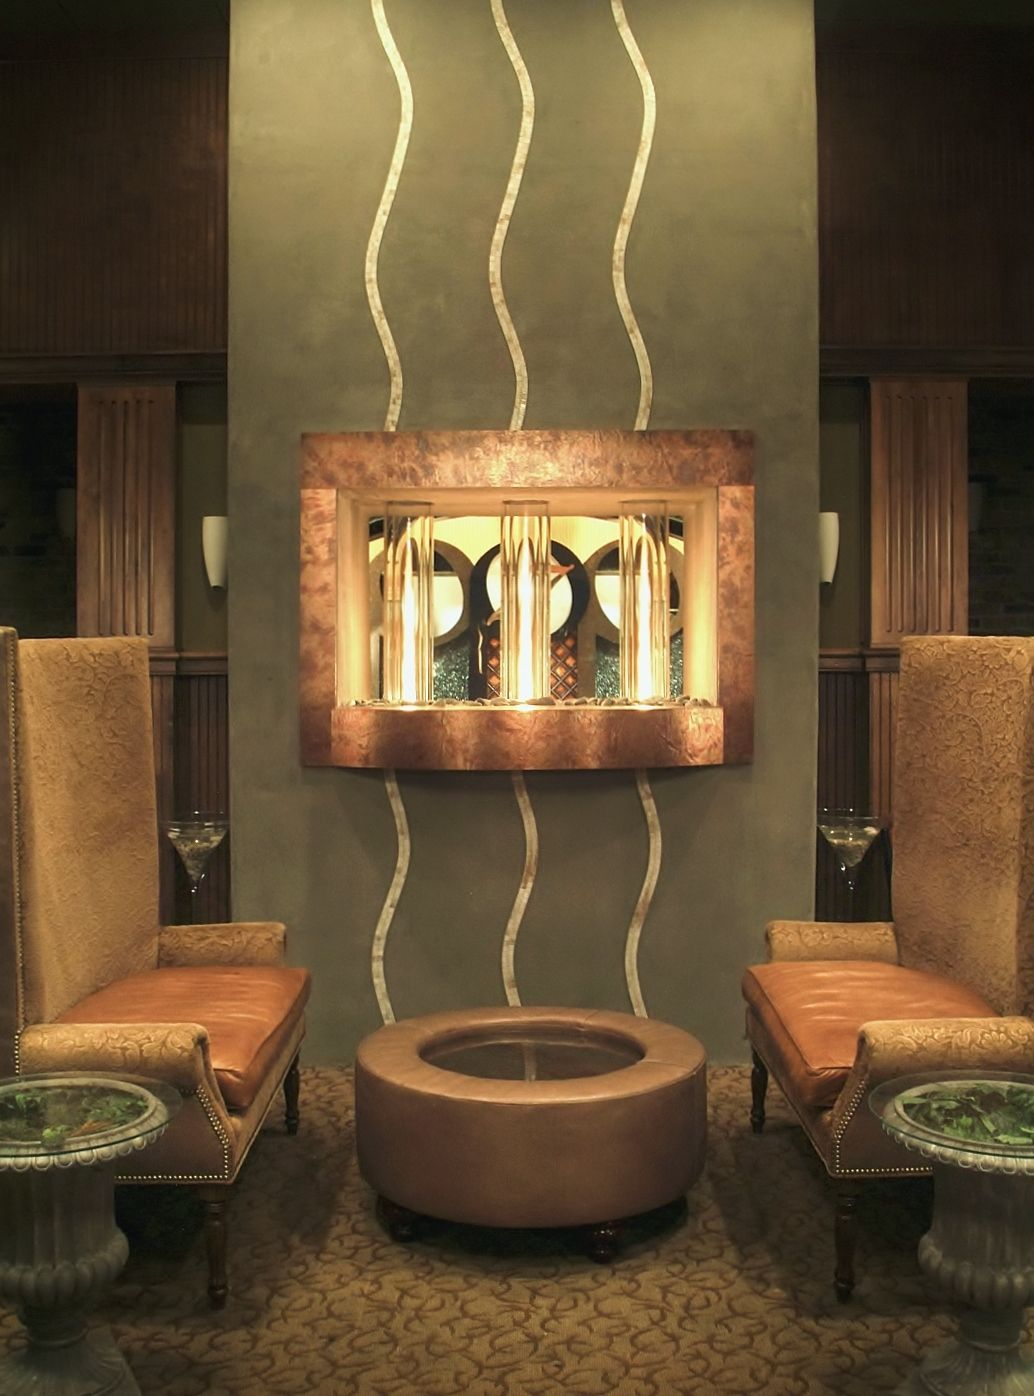 Heat N Glo fireplace, cyclone custs | Hospitality I Have Created ...